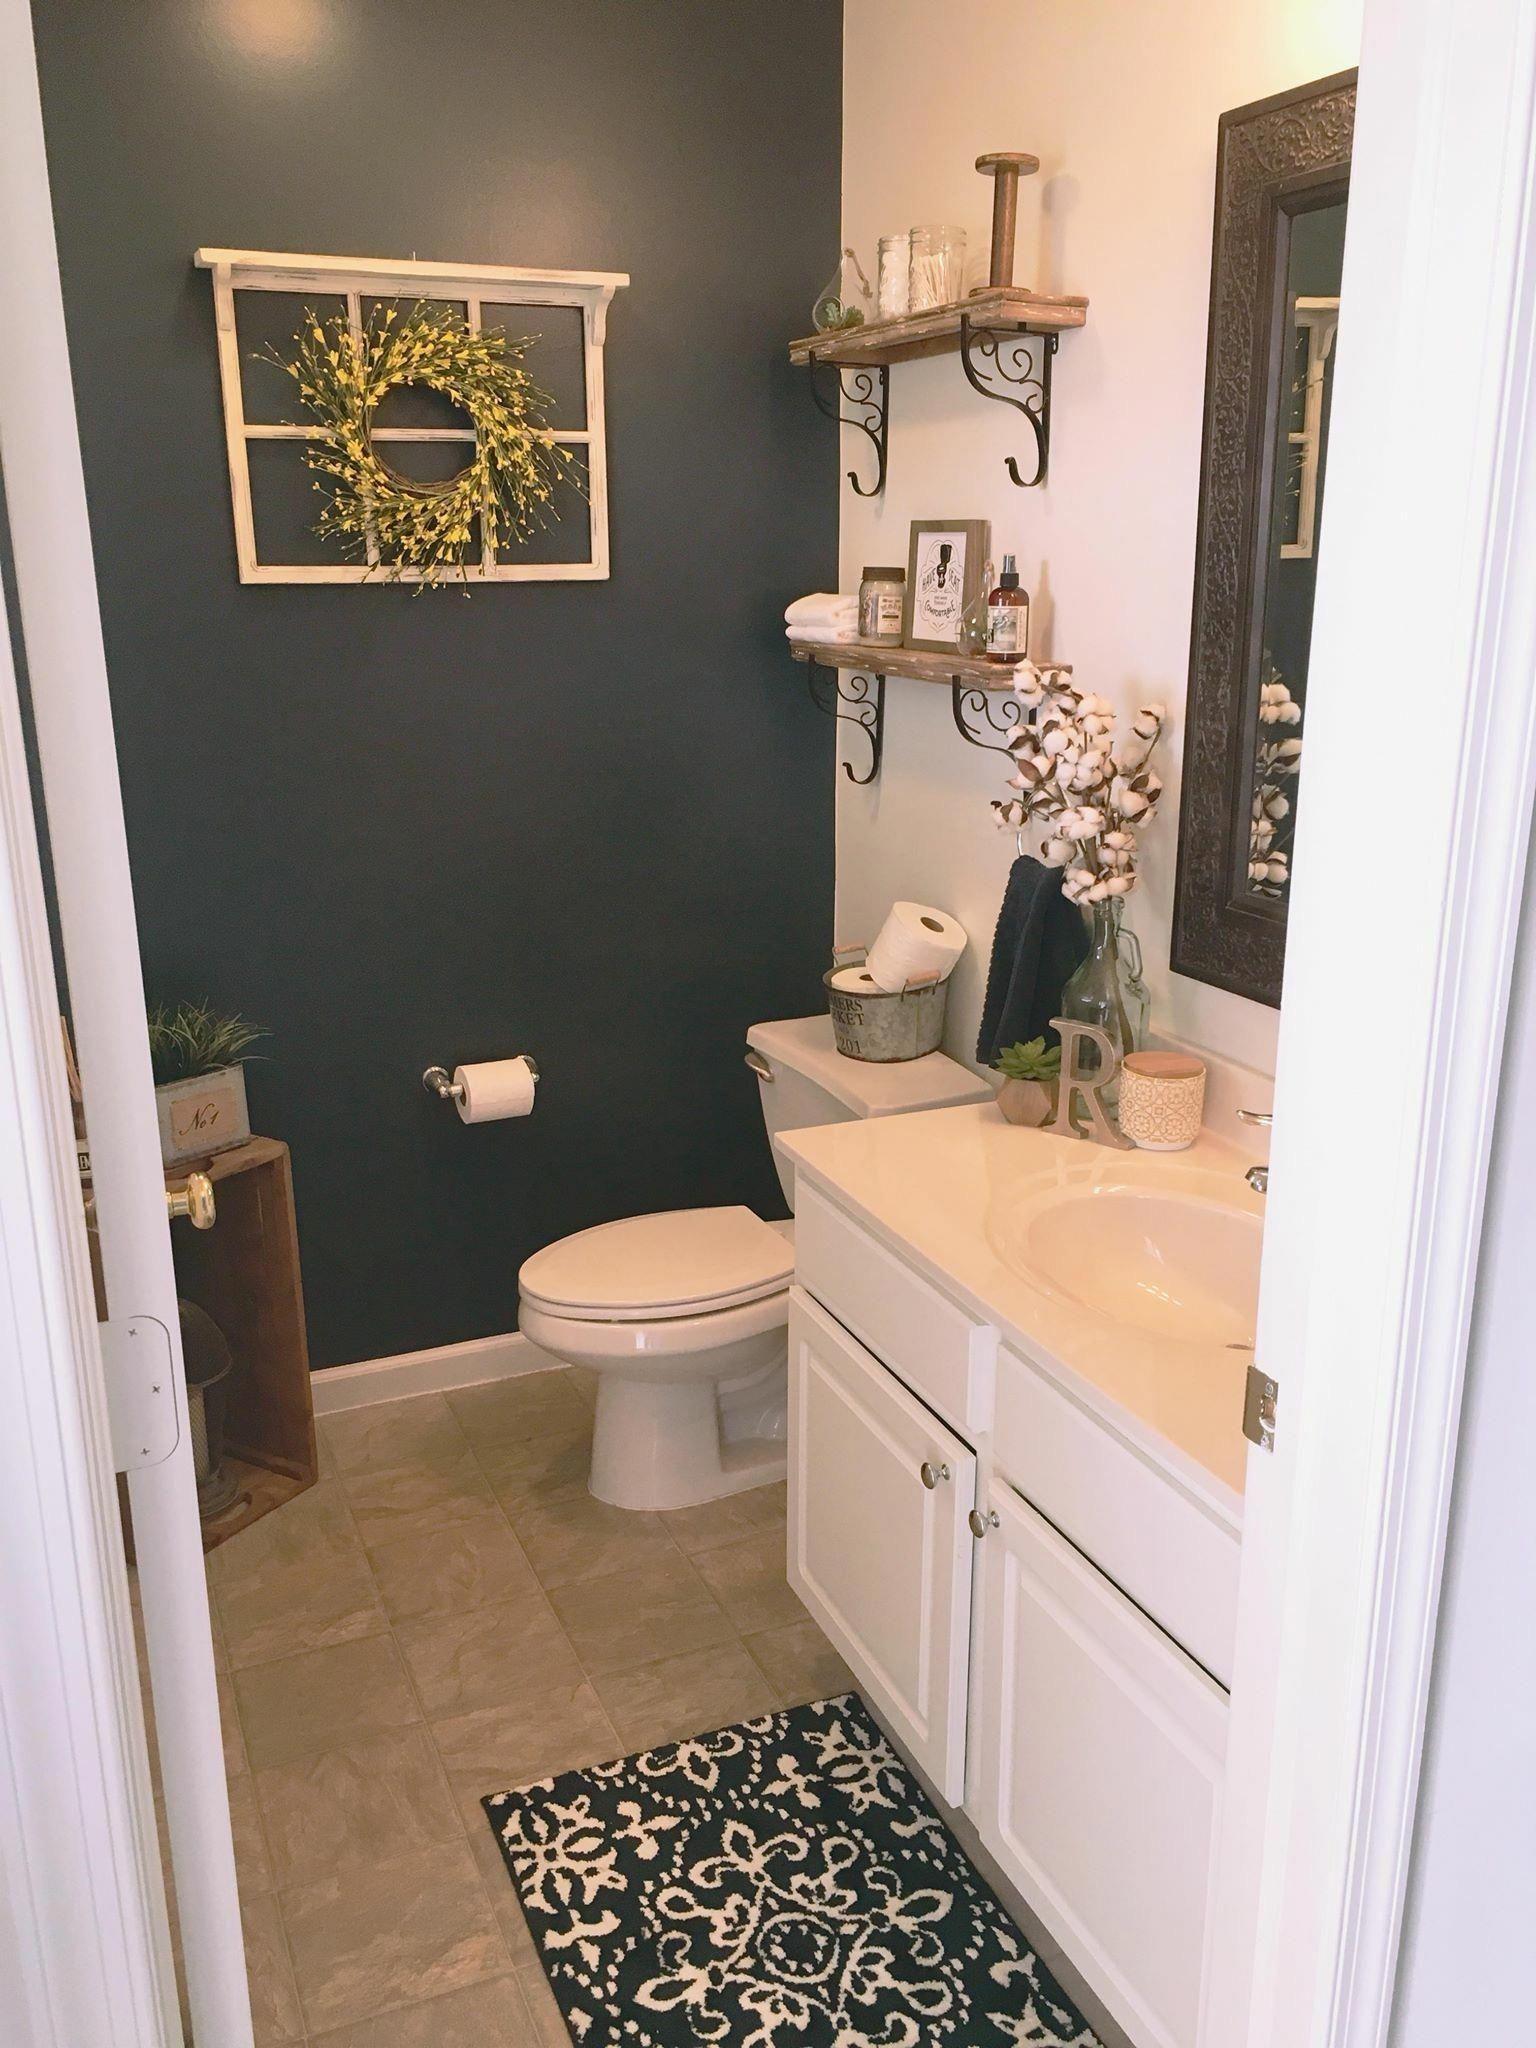 Dark Blue Accent Wall 29 Guest Bathroom Ideas To Wow Your Visitors Halfbathroom Bathroomremodeling Bathro In 2020 Bathrooms Remodel Guest Bathrooms Small Bathroom